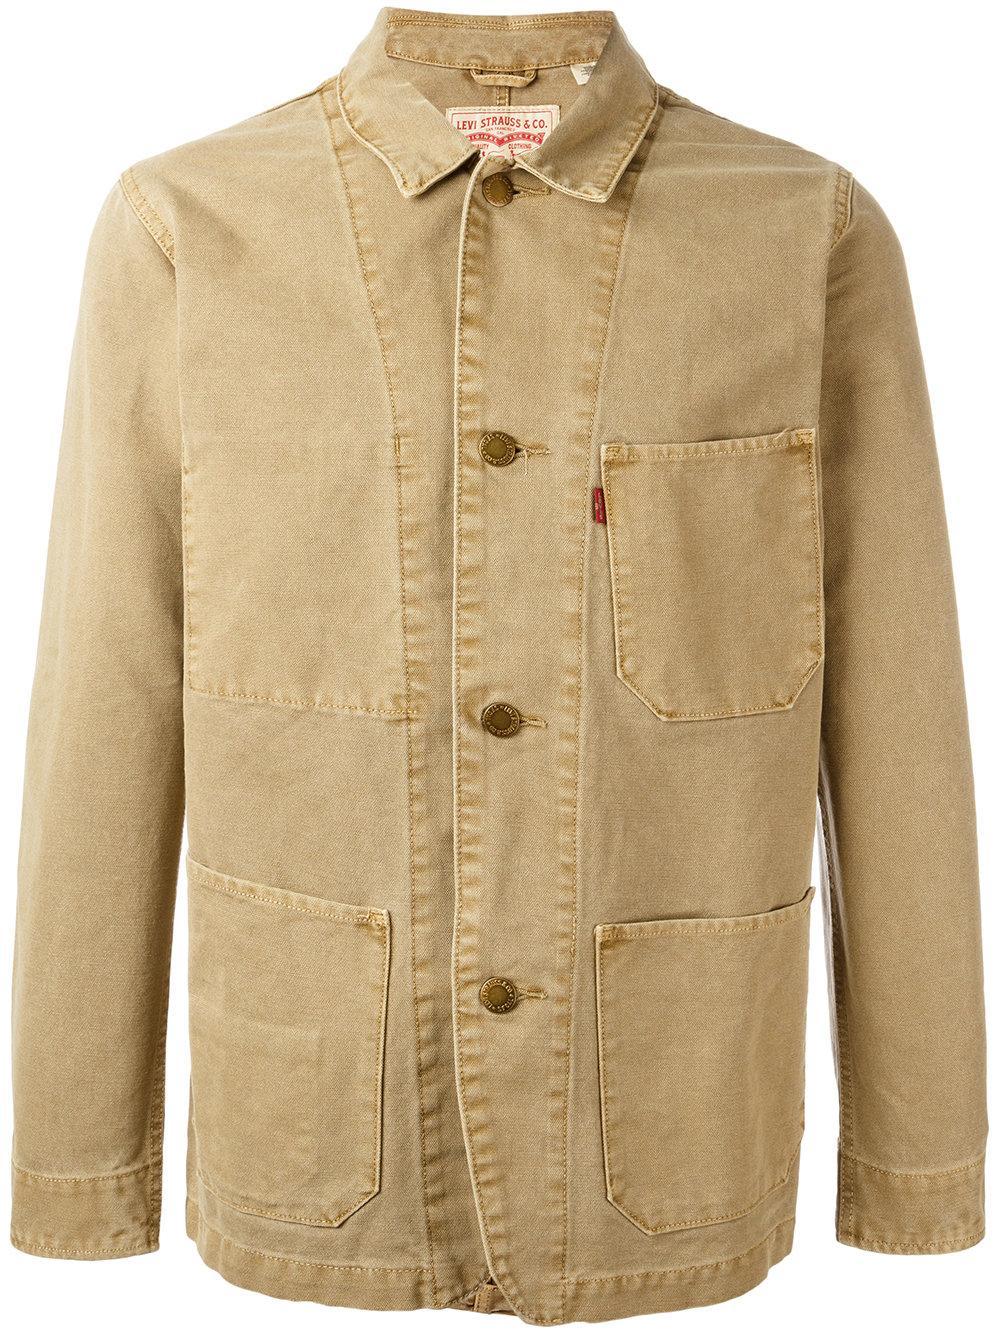 Levi S Engineers Denim Jacket In Brown For Men Lyst